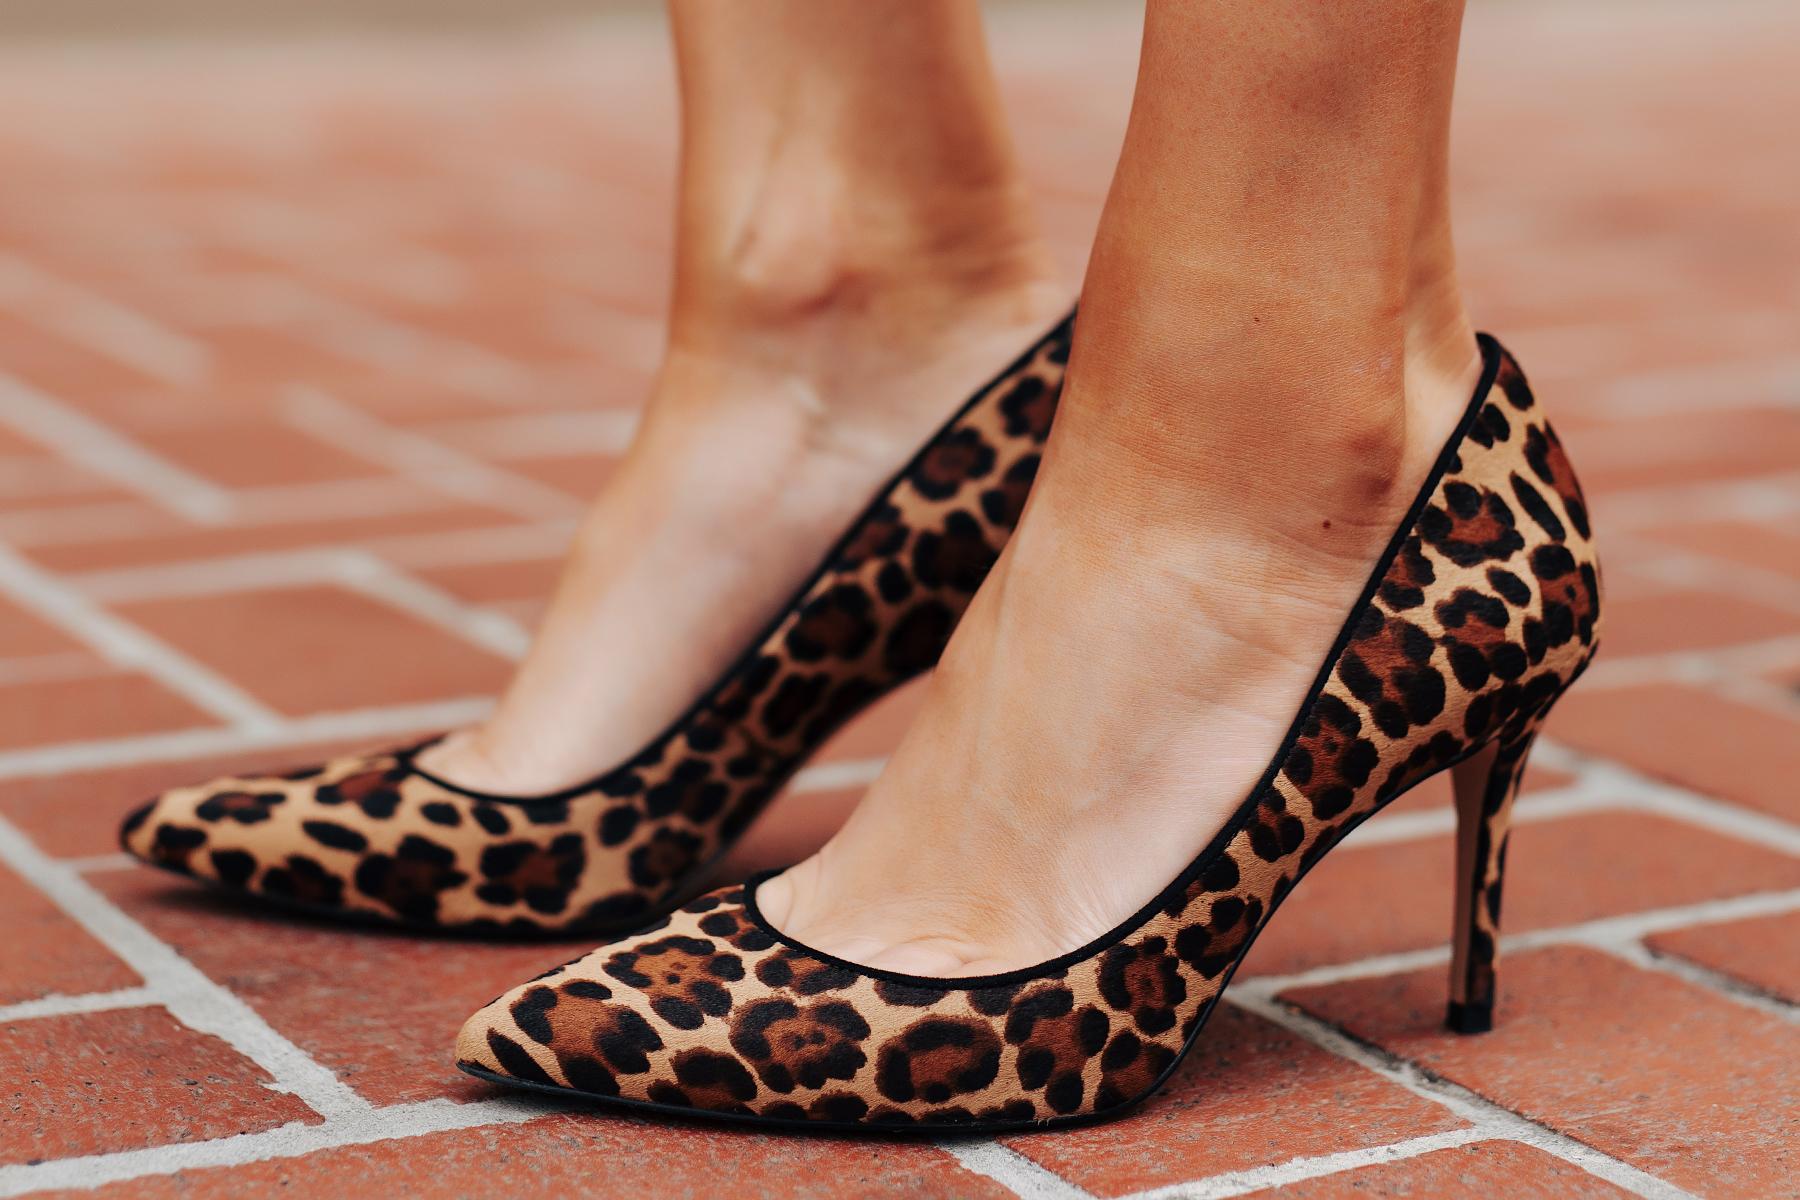 Fashion Jackson Wearing Ann Taylor Leopard Pumps